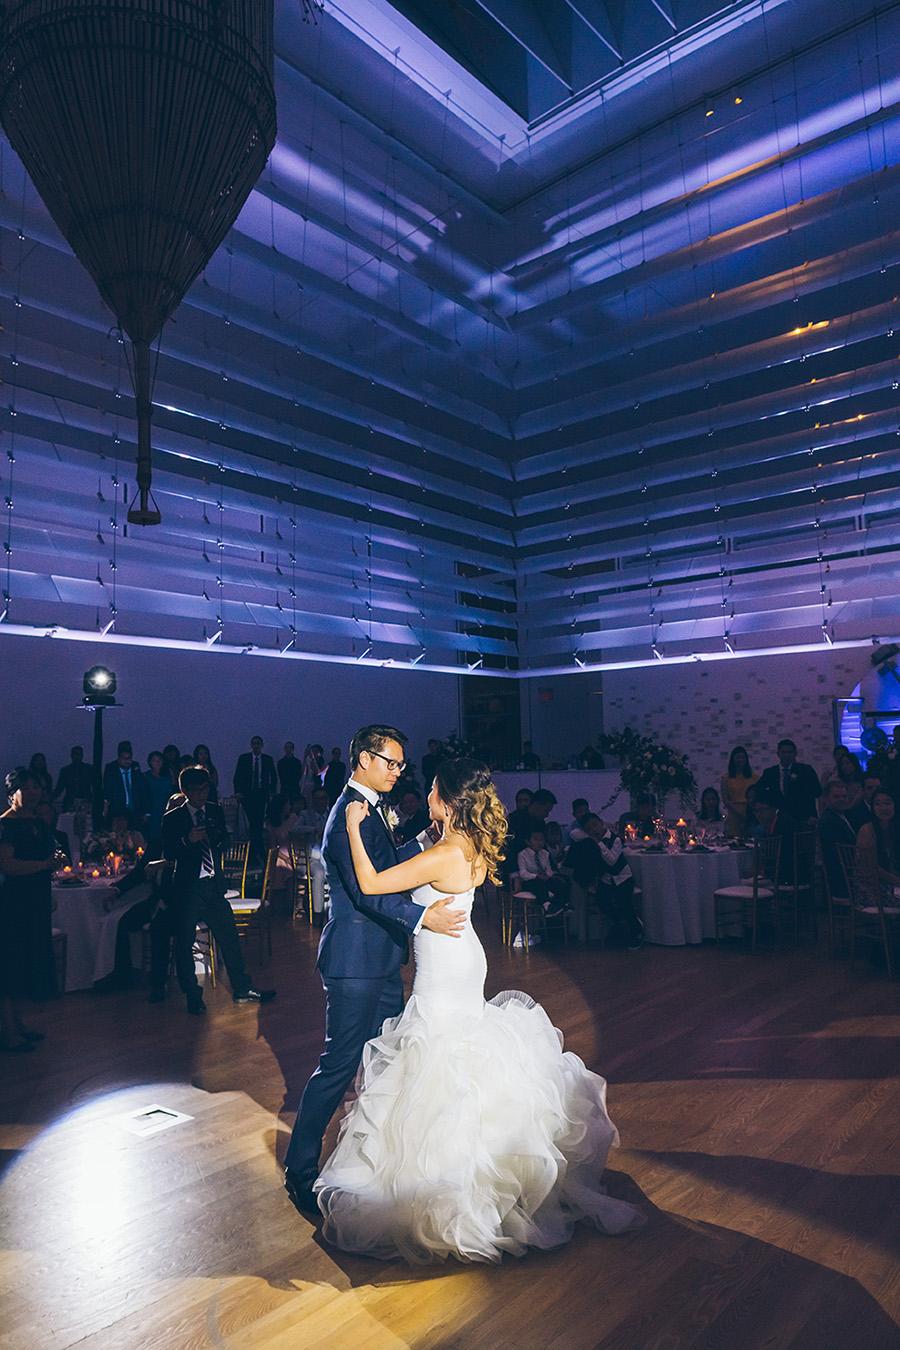 JUDITH-IRVING-NYC-WEDDING-RECEPTION-CYNTHIACHUNG-0100.jpg